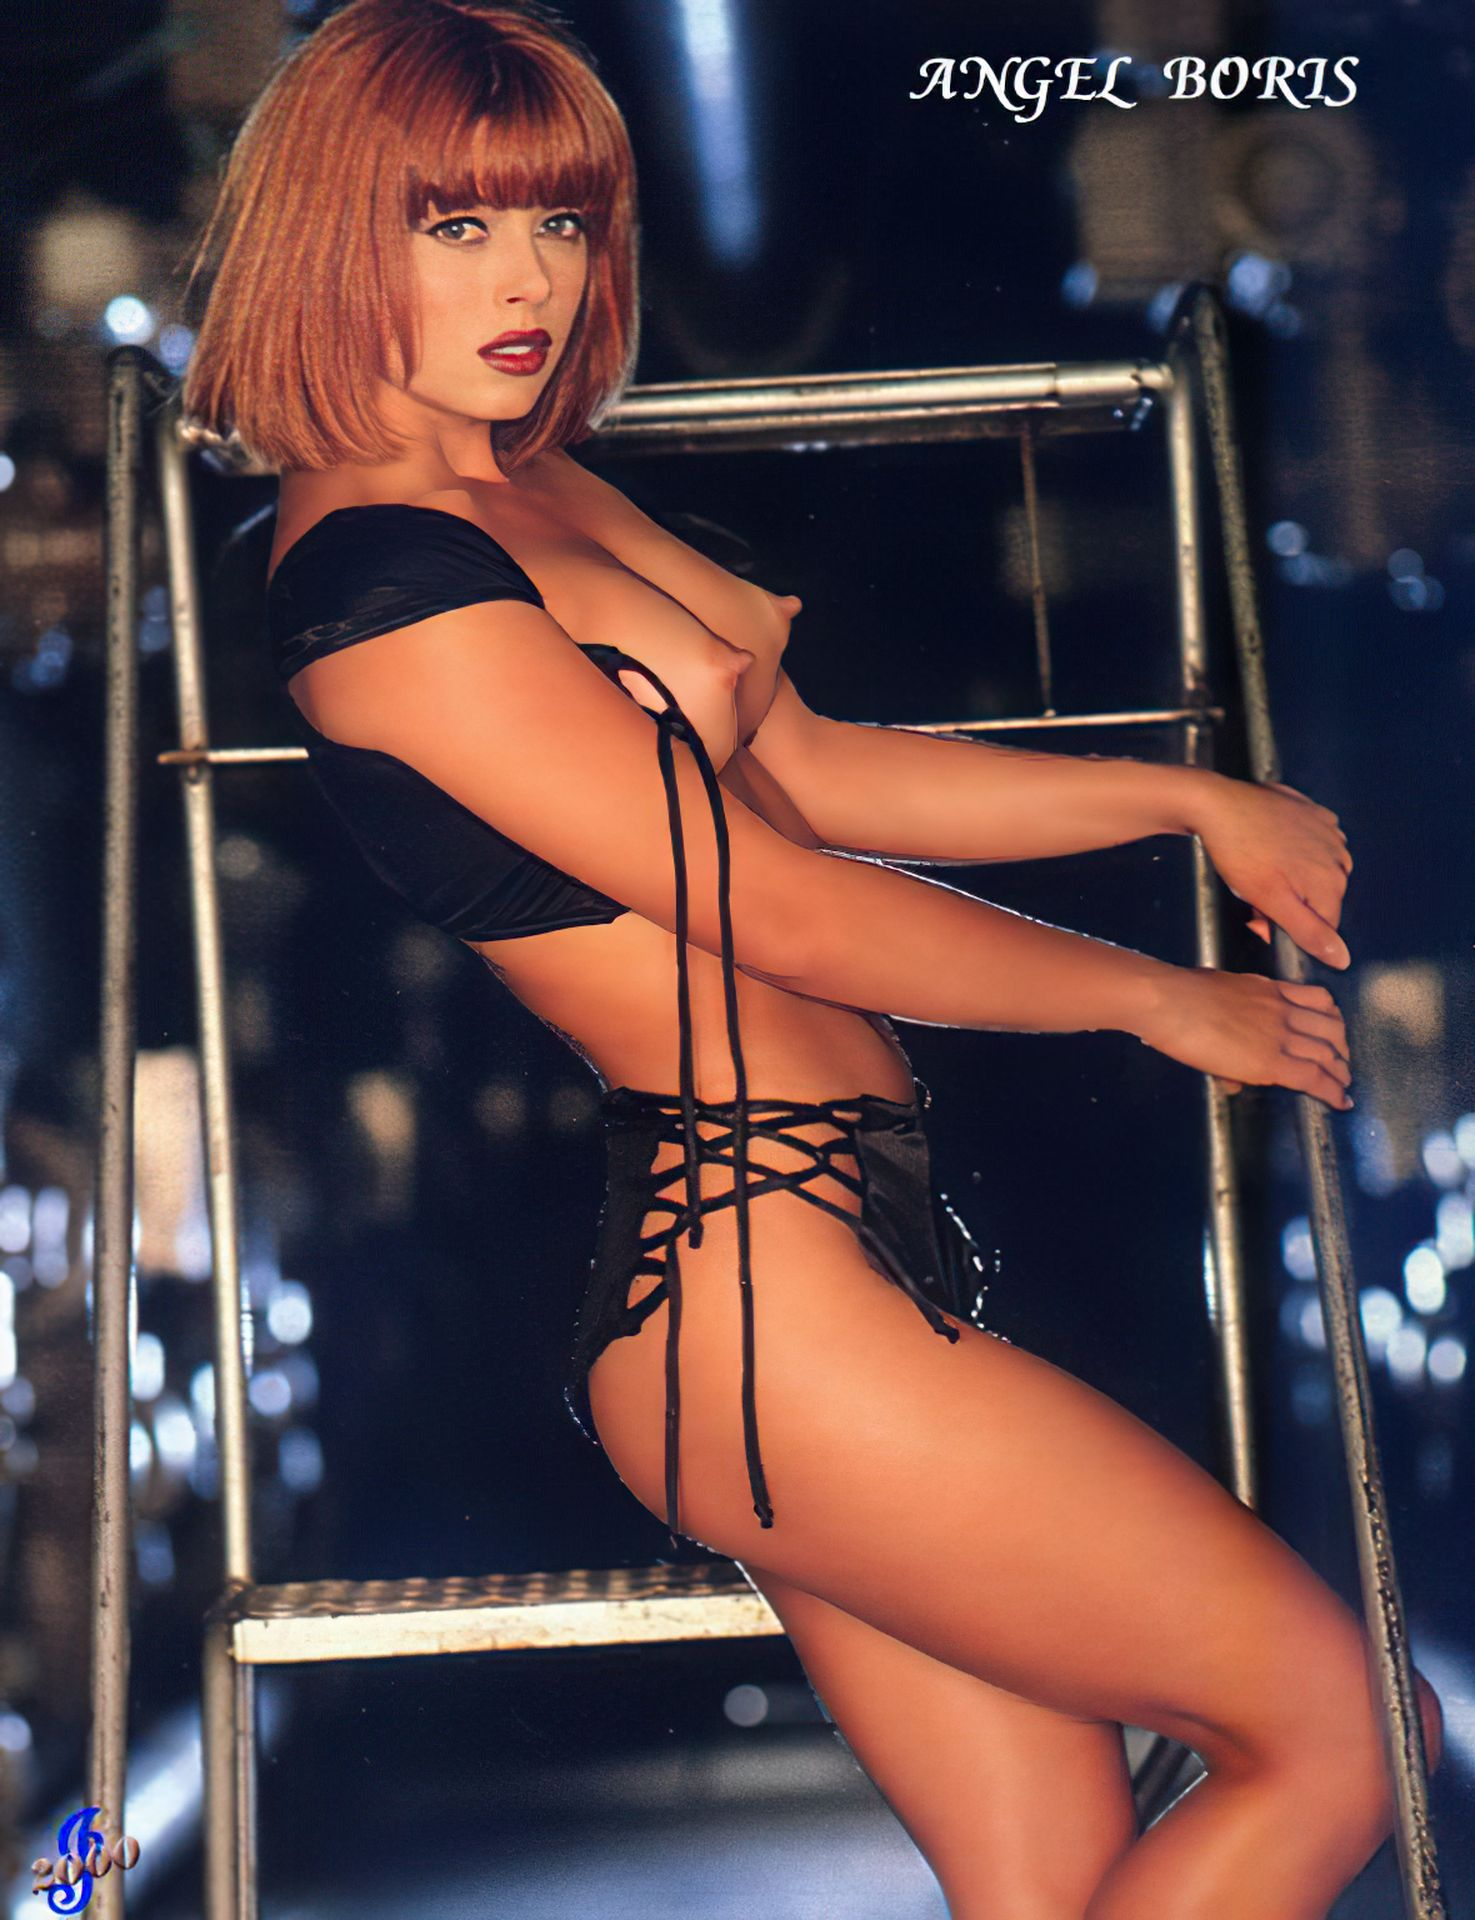 Warm Angla Boirs Nude Images